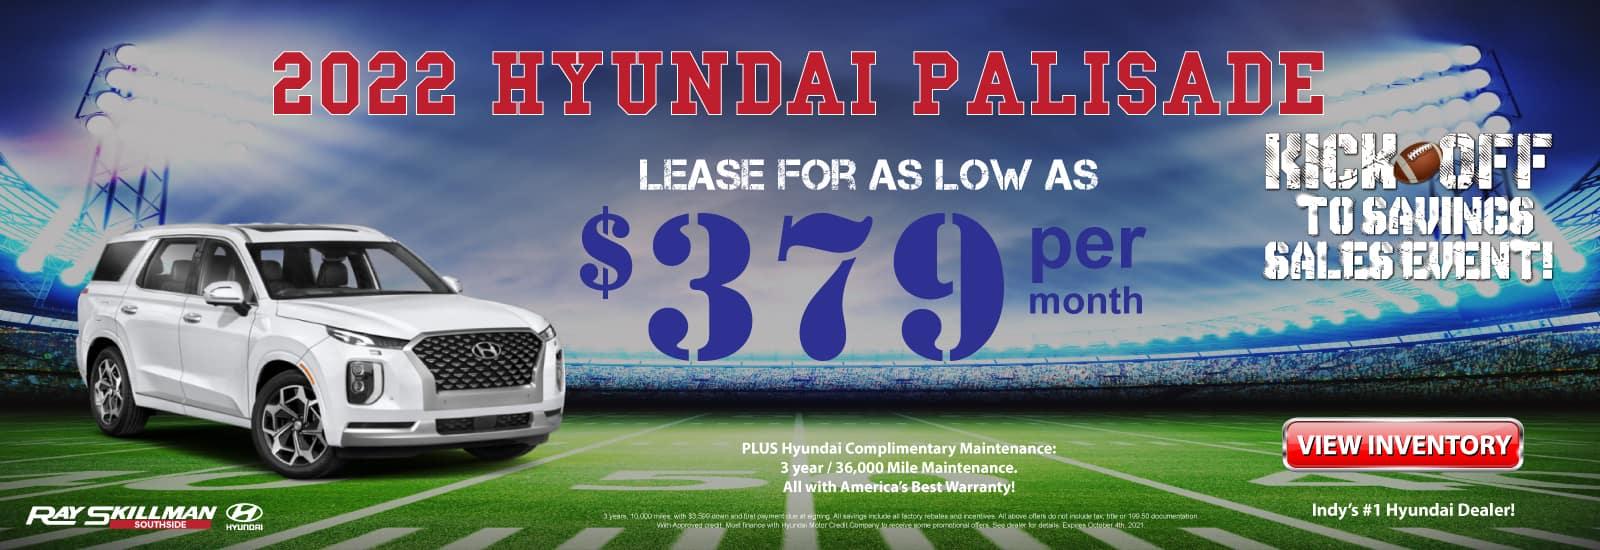 2022-Hyundai-Palisade-Web-Banner-1600×550 (002).jpg-Sept